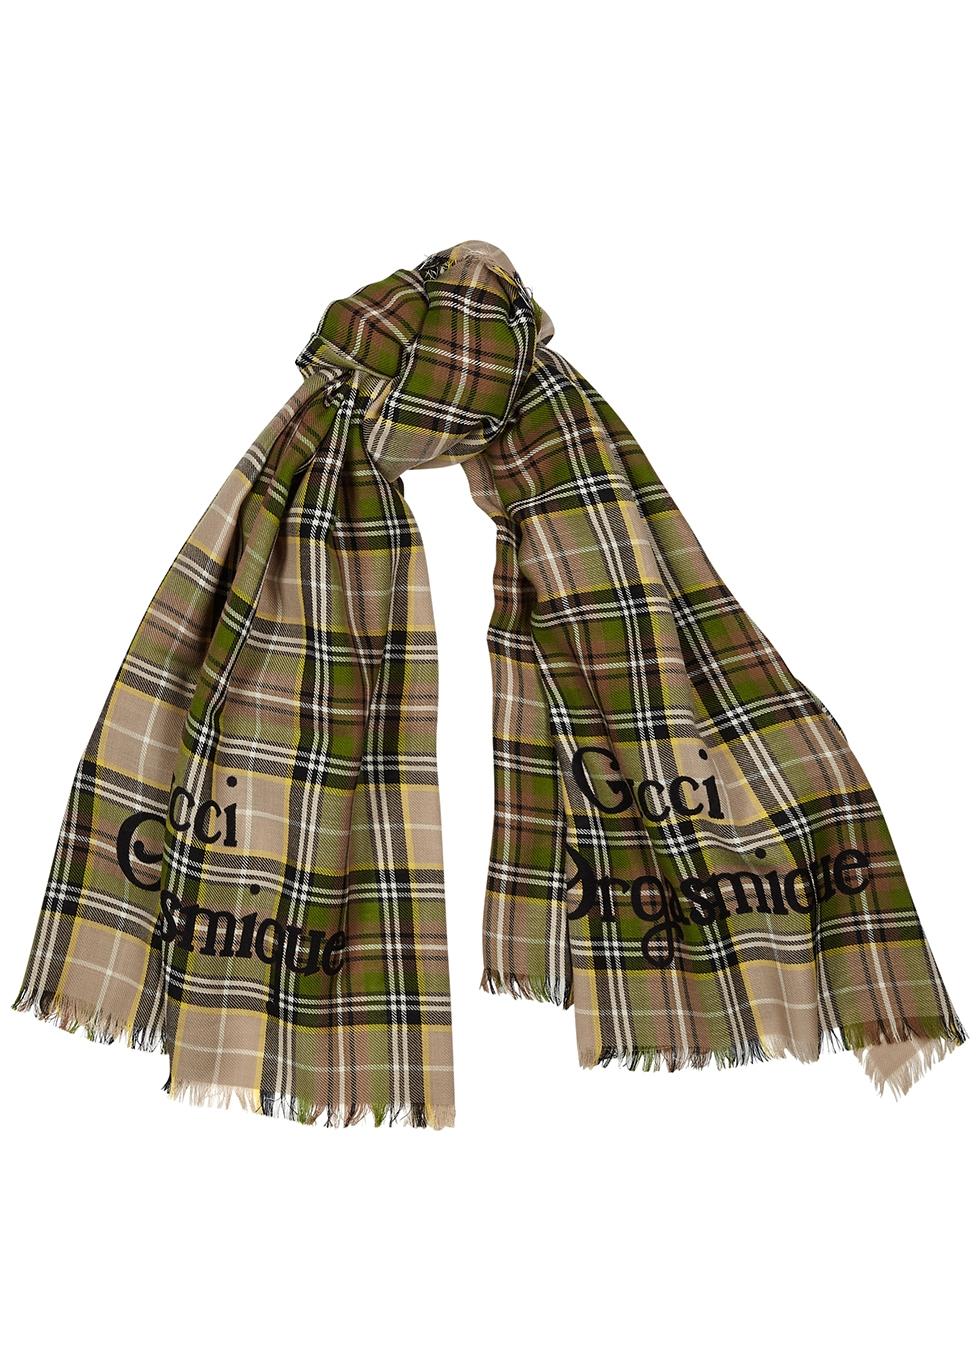 Gucci Orgasmique checked wool scarf